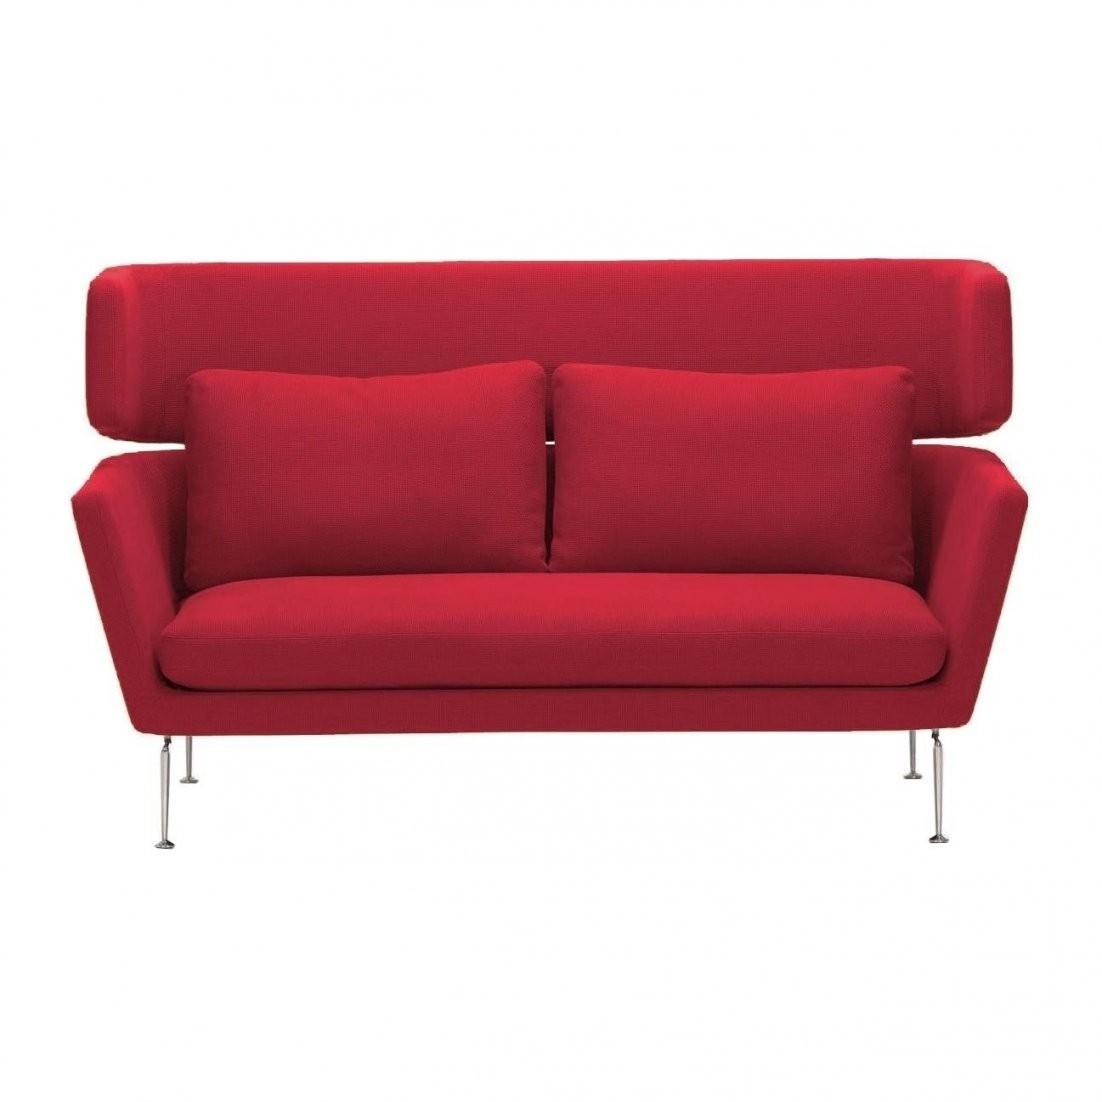 Vitra Suita Citterio 2Sitzer Sofa  Ambientedirect von 2 Sitzer Sofa Rot Bild